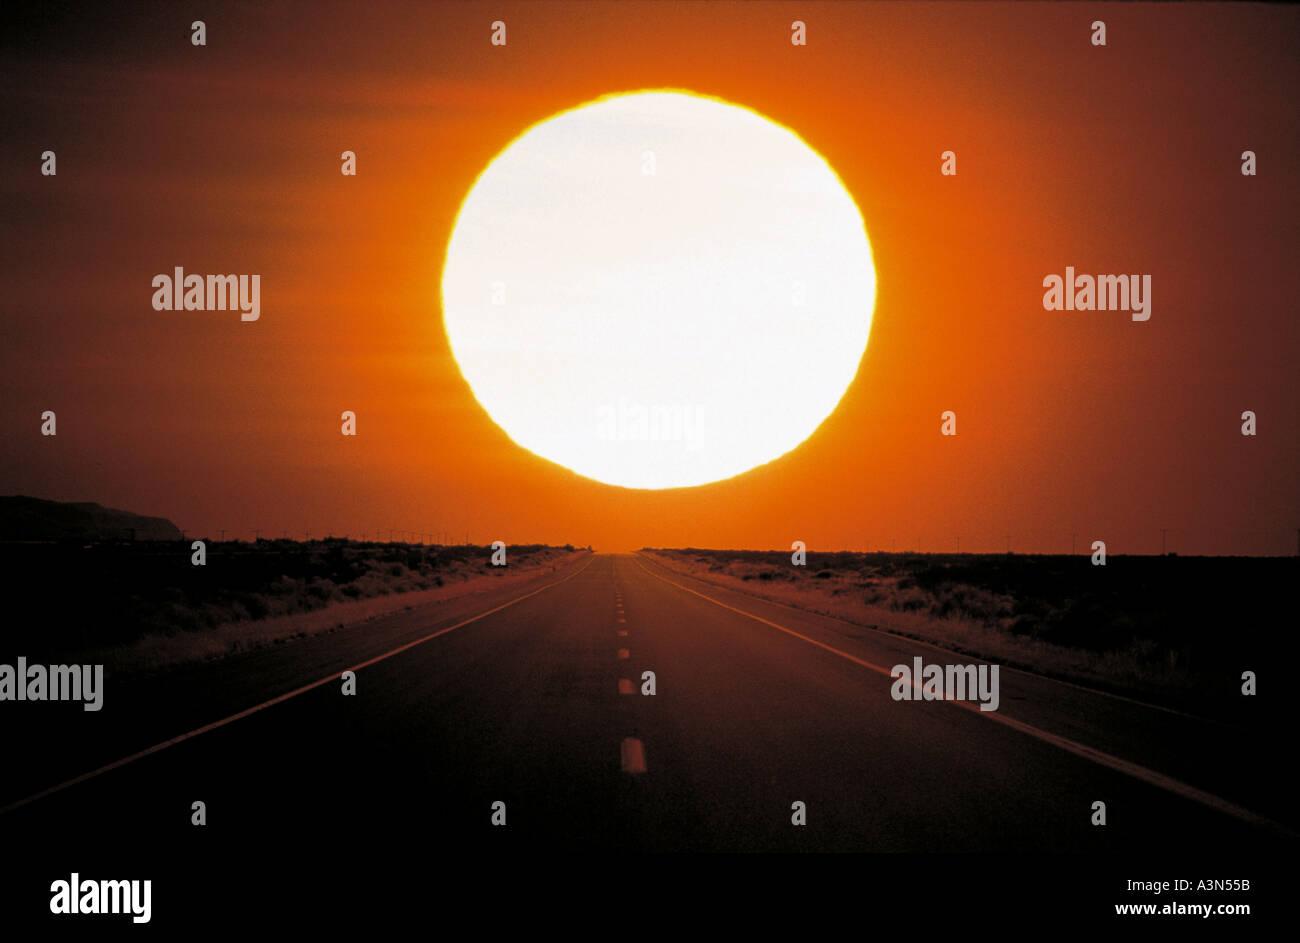 Road Nature Sky Sun Fields - Stock Image